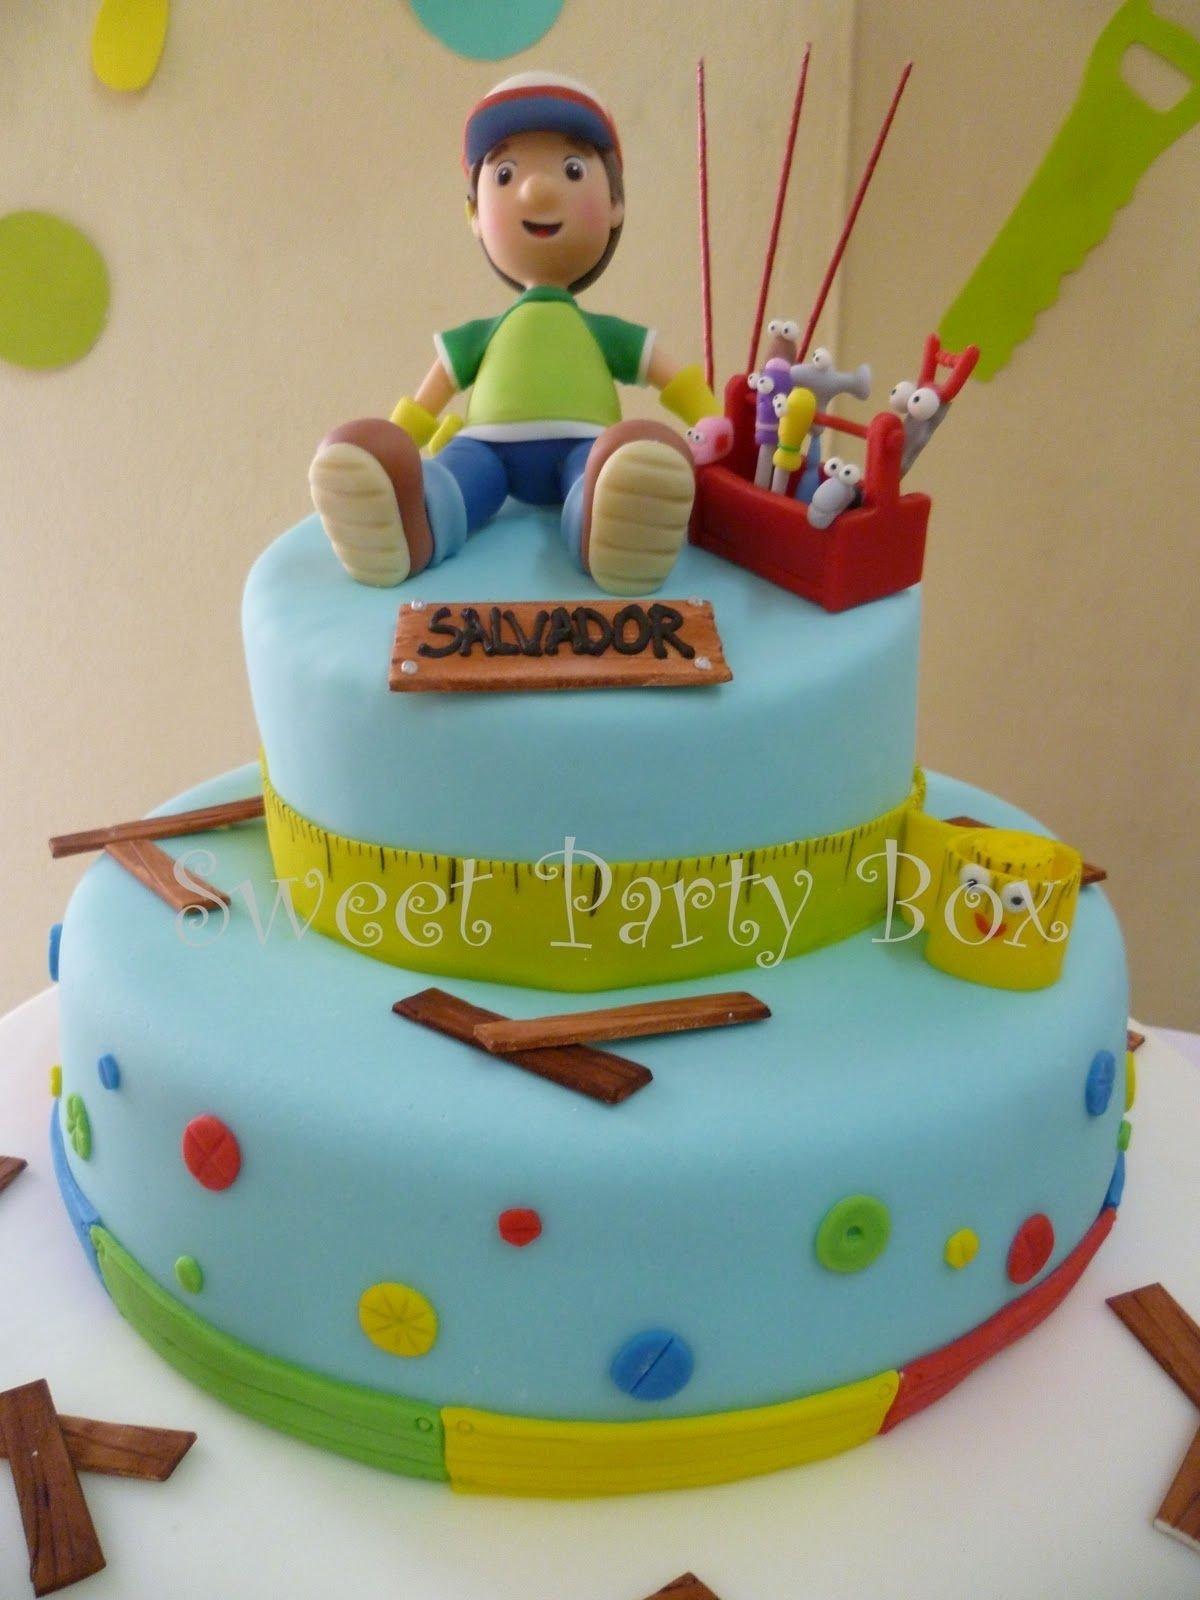 10 Amazing Handy Manny Birthday Party Ideas sweet party box cumple de salvador manny a la obra handy manny 2020